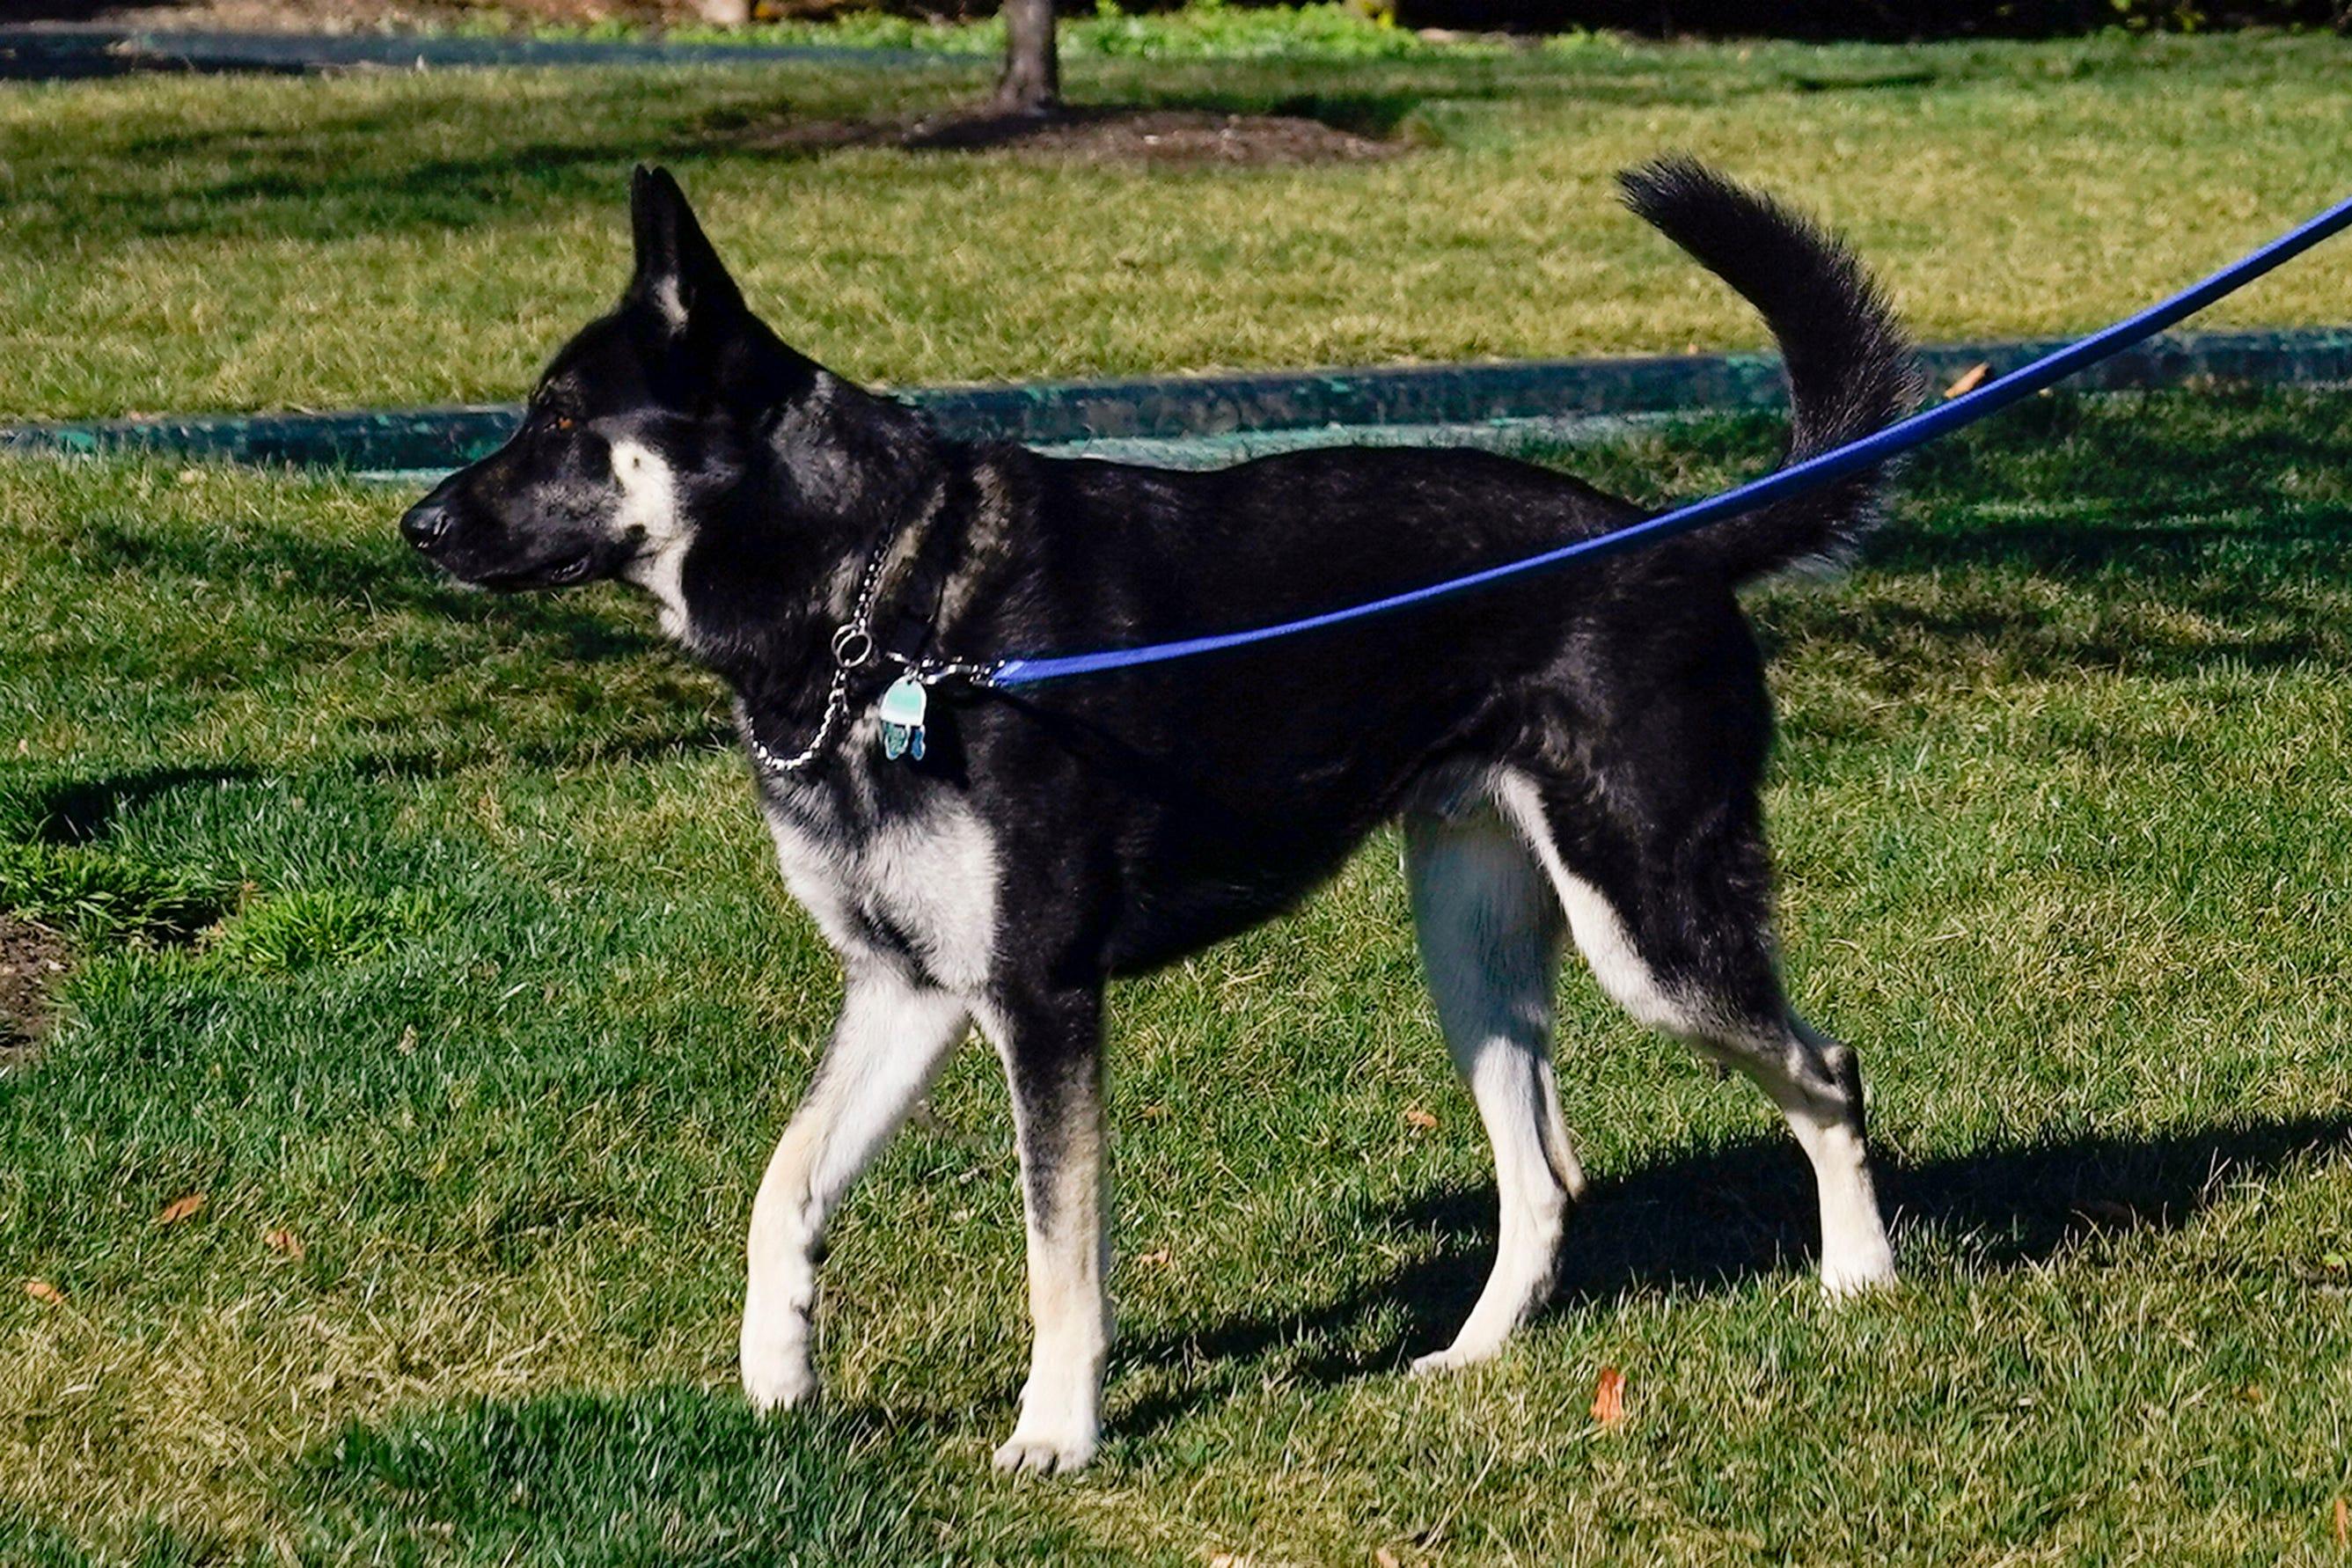 'Major' pain: Biden's dog involved in 2nd biting incident 2